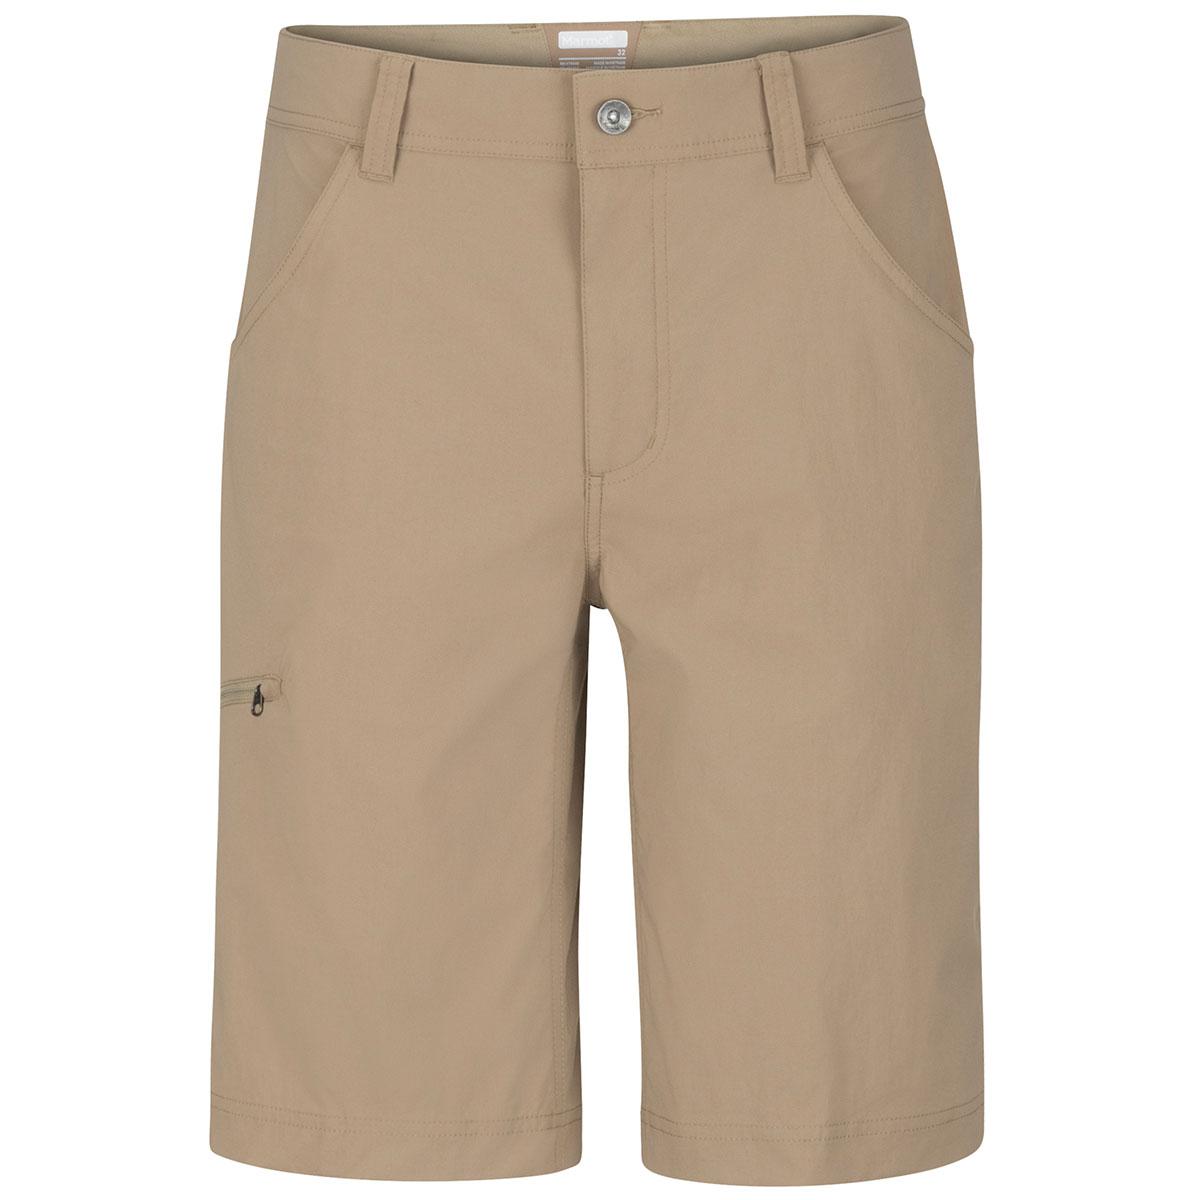 Marmot Men's Arch Rock Shorts - Brown, 38